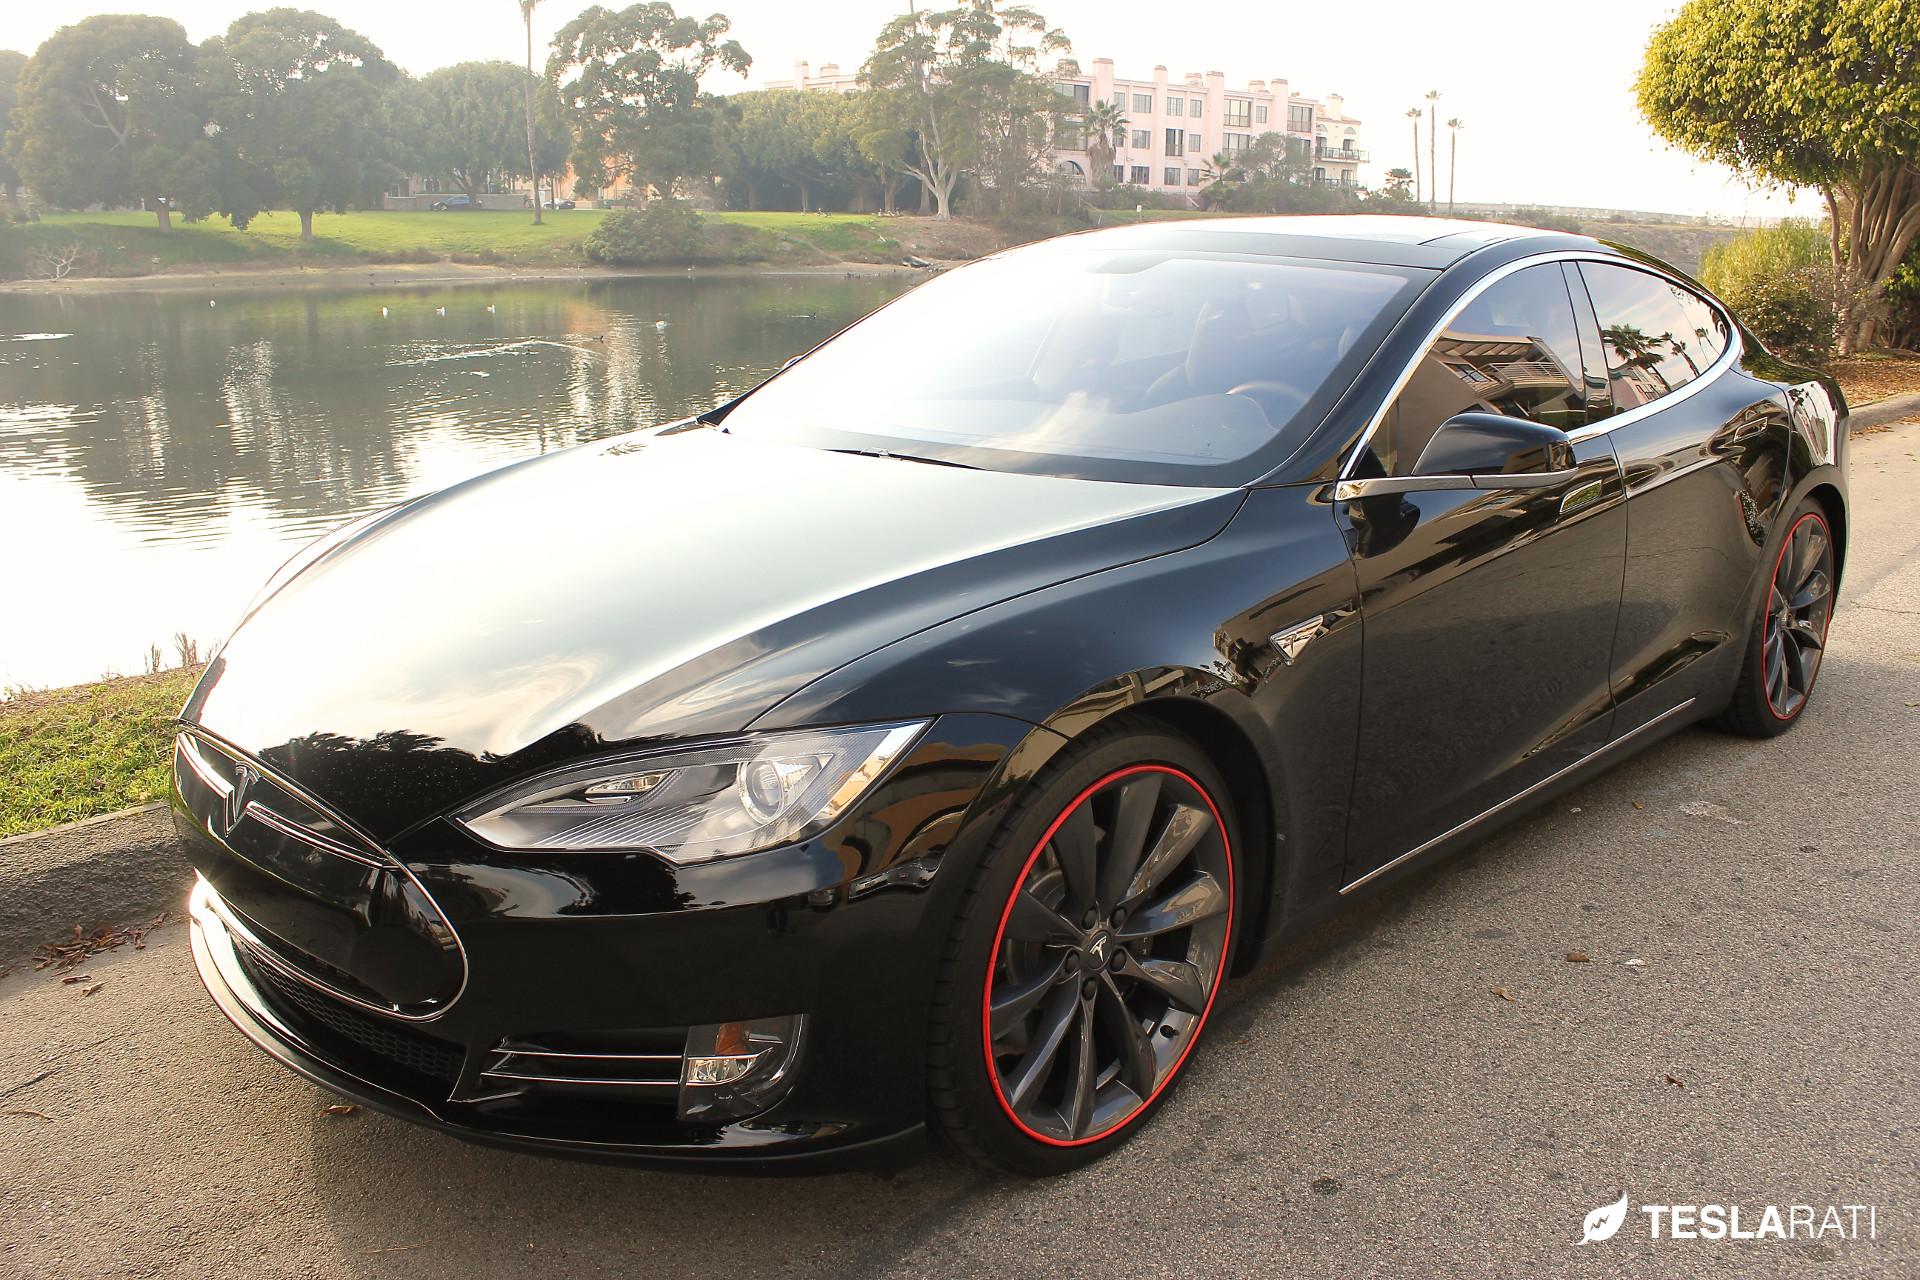 Tesla-Folding-Electric-Bike-Prodeco-27